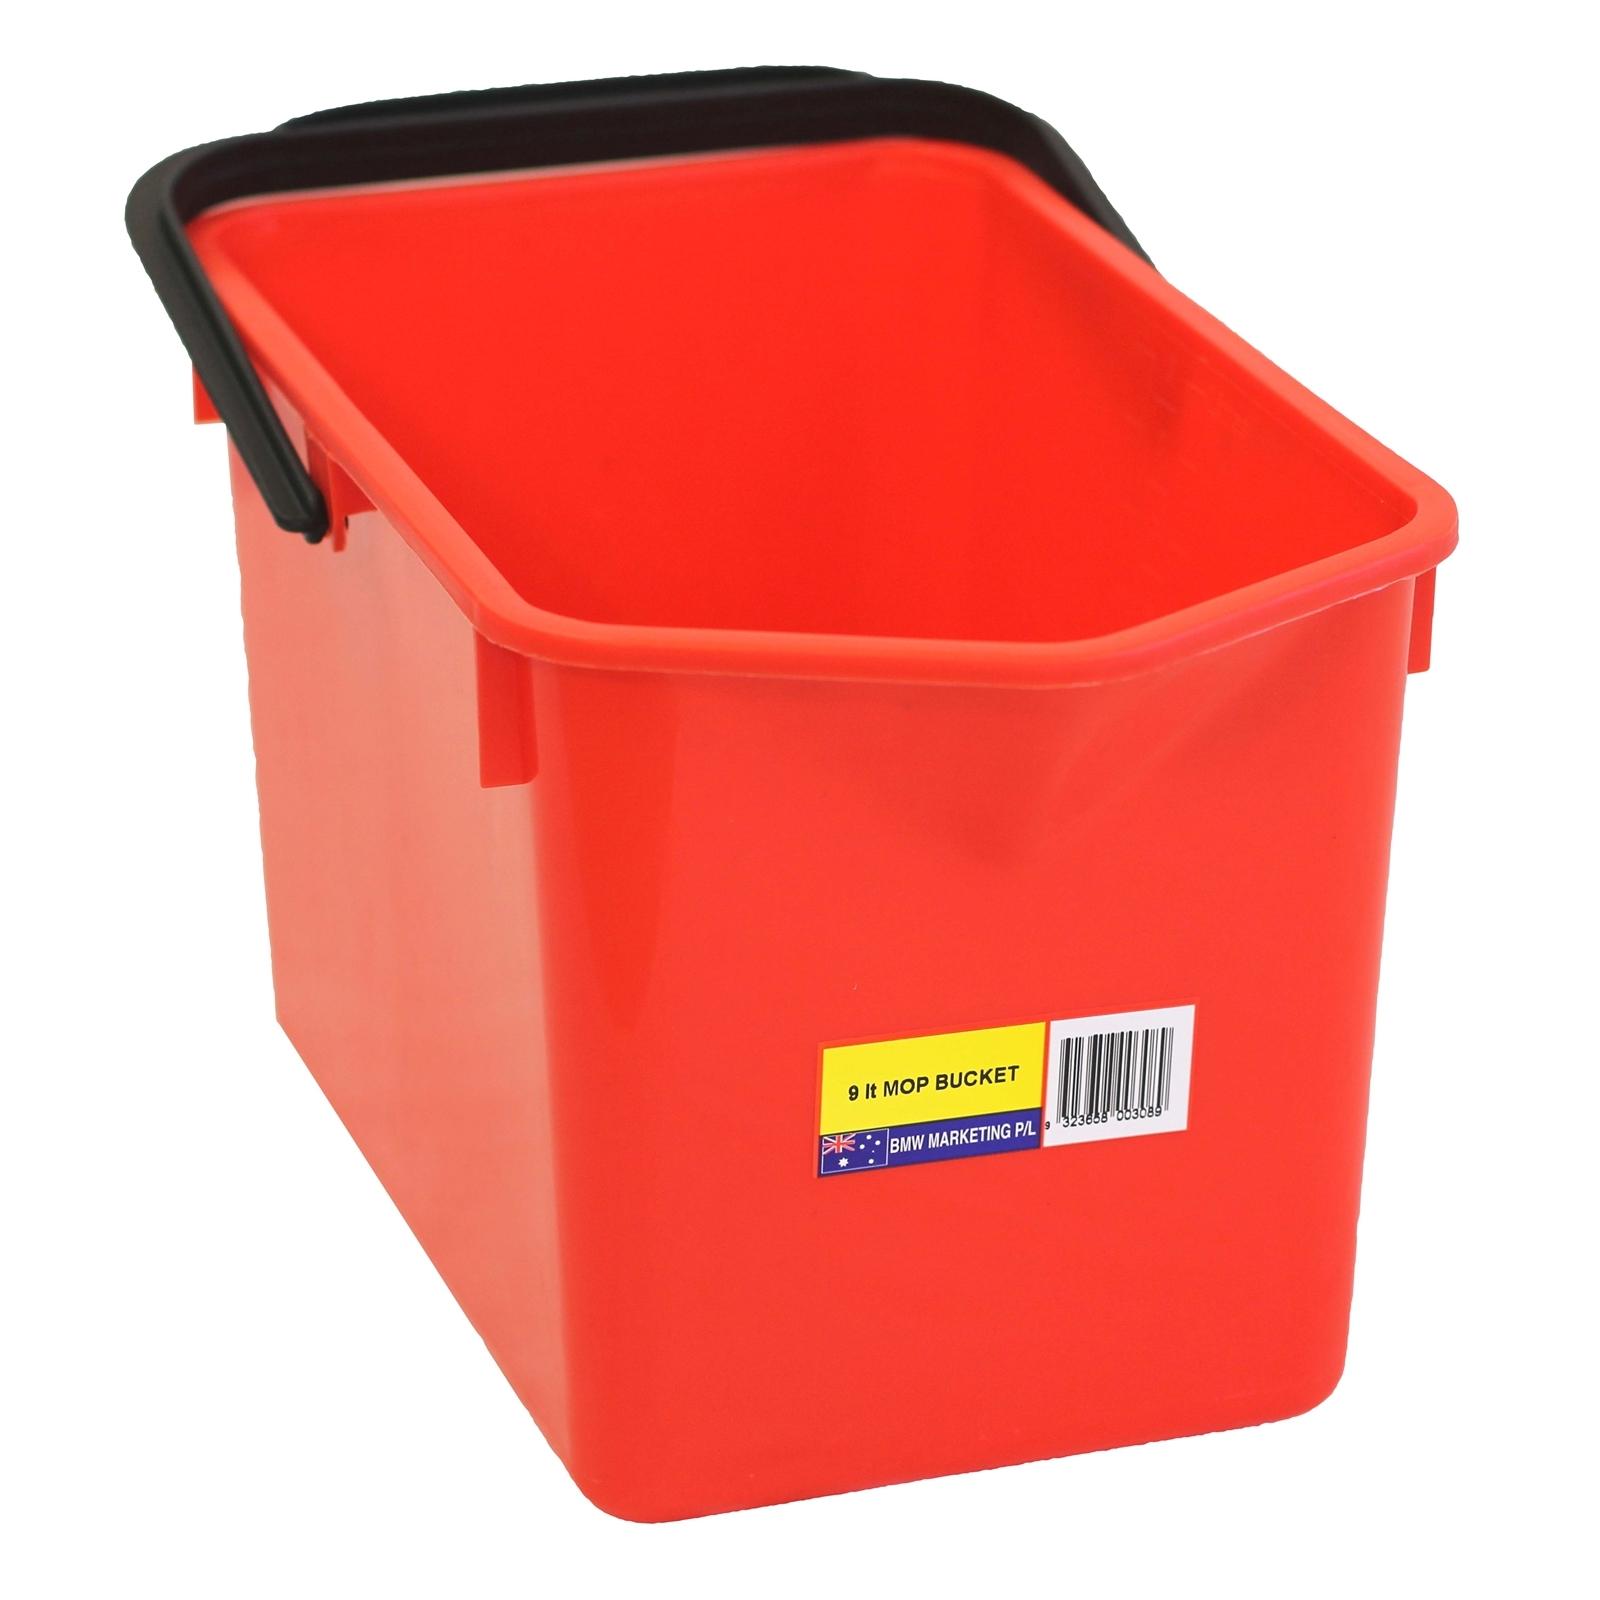 Icon Plastics 9L Mop Bucket